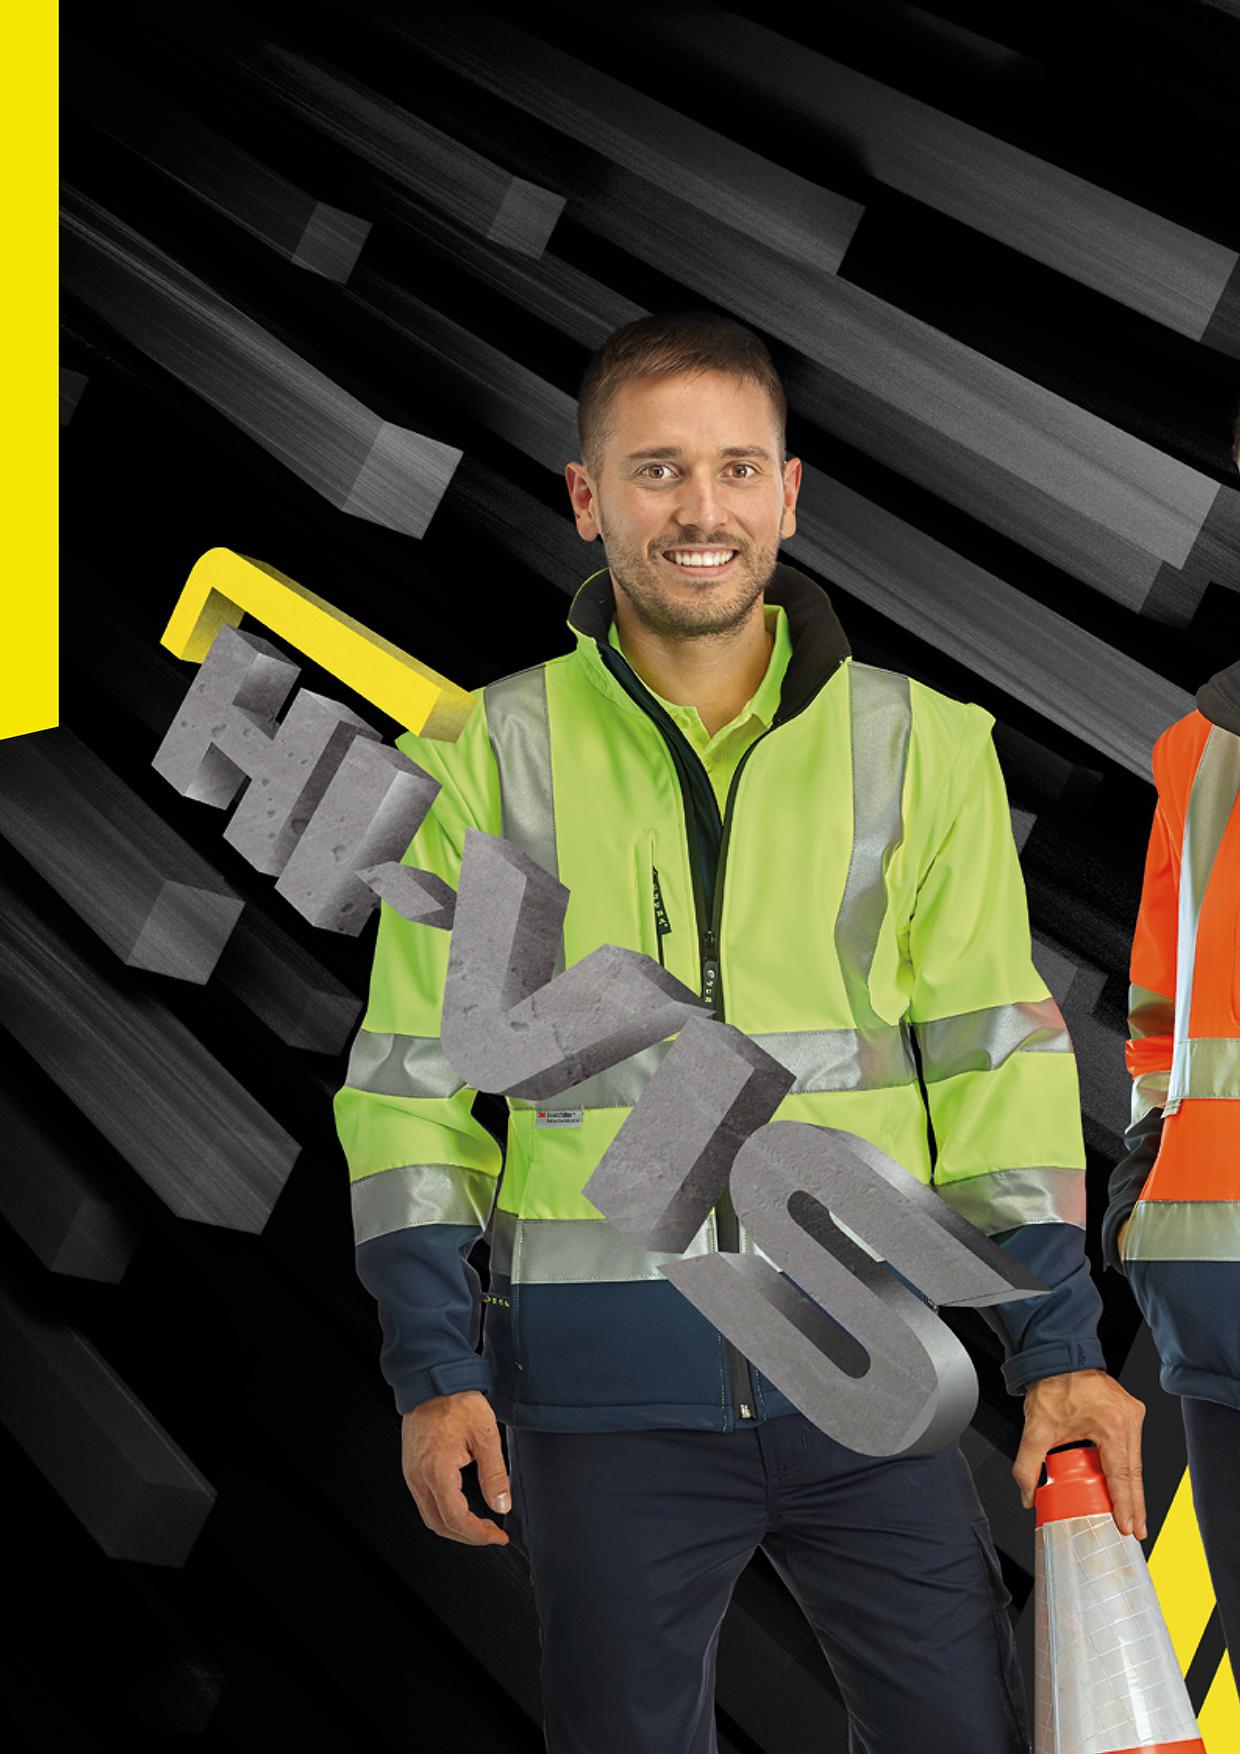 Workwear Alta visibilidade